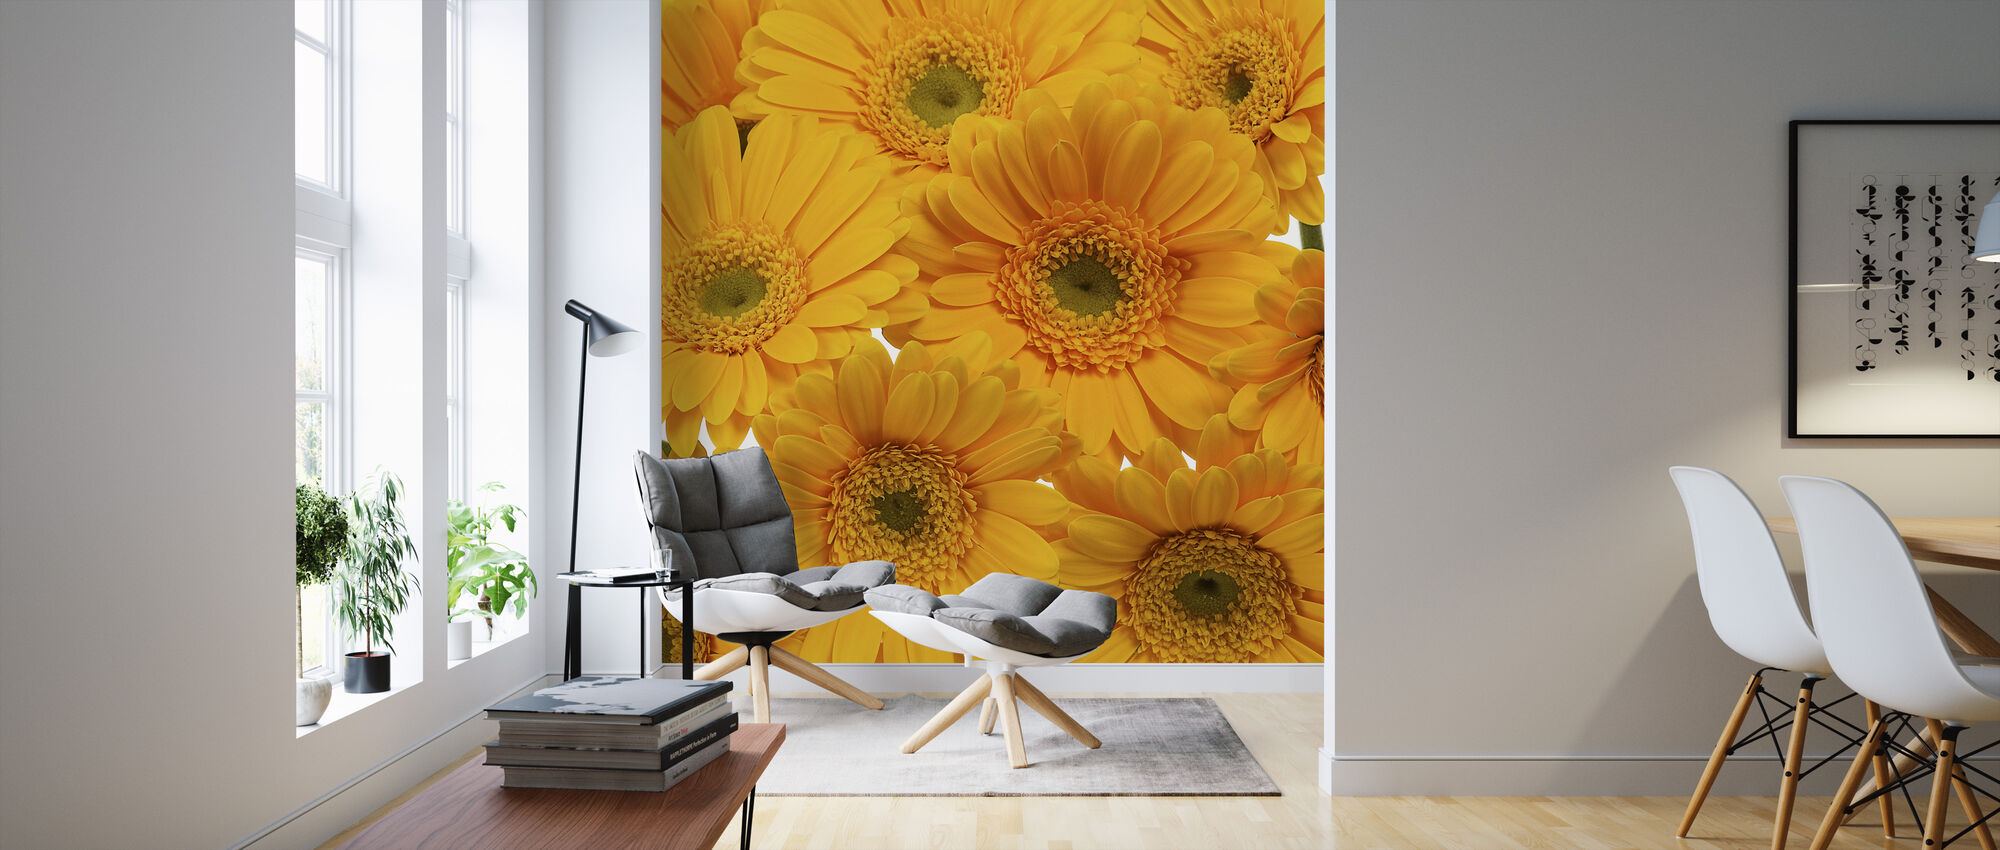 Yellow Gerbera Close Up - Wallpaper - Living Room